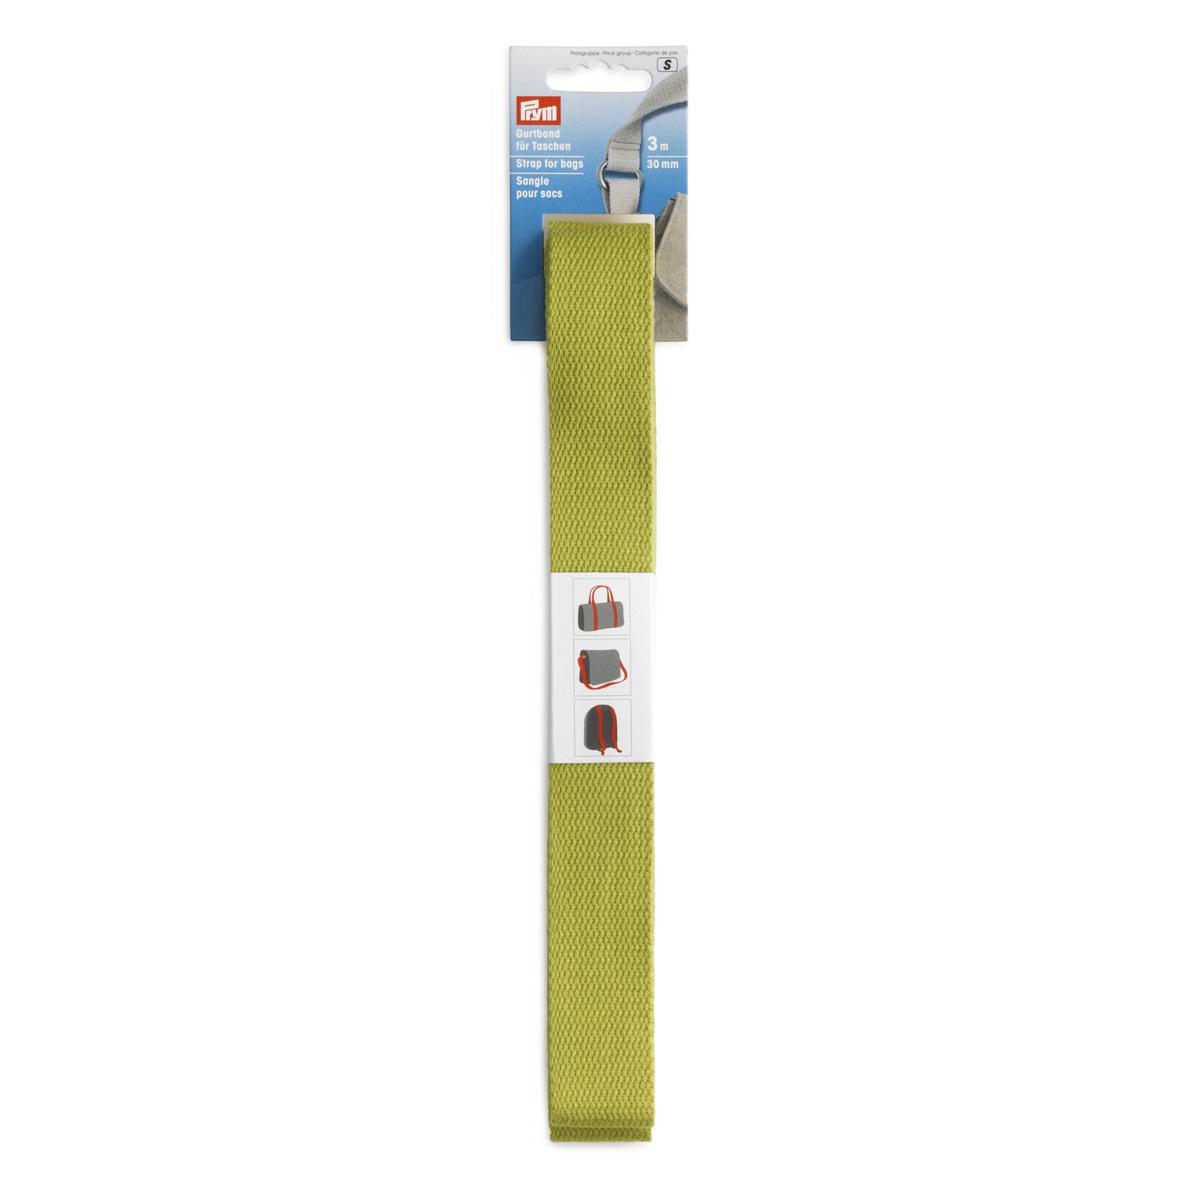 965190 Лента-ремень для сумок 30мм*3м цв.зеленый Prym